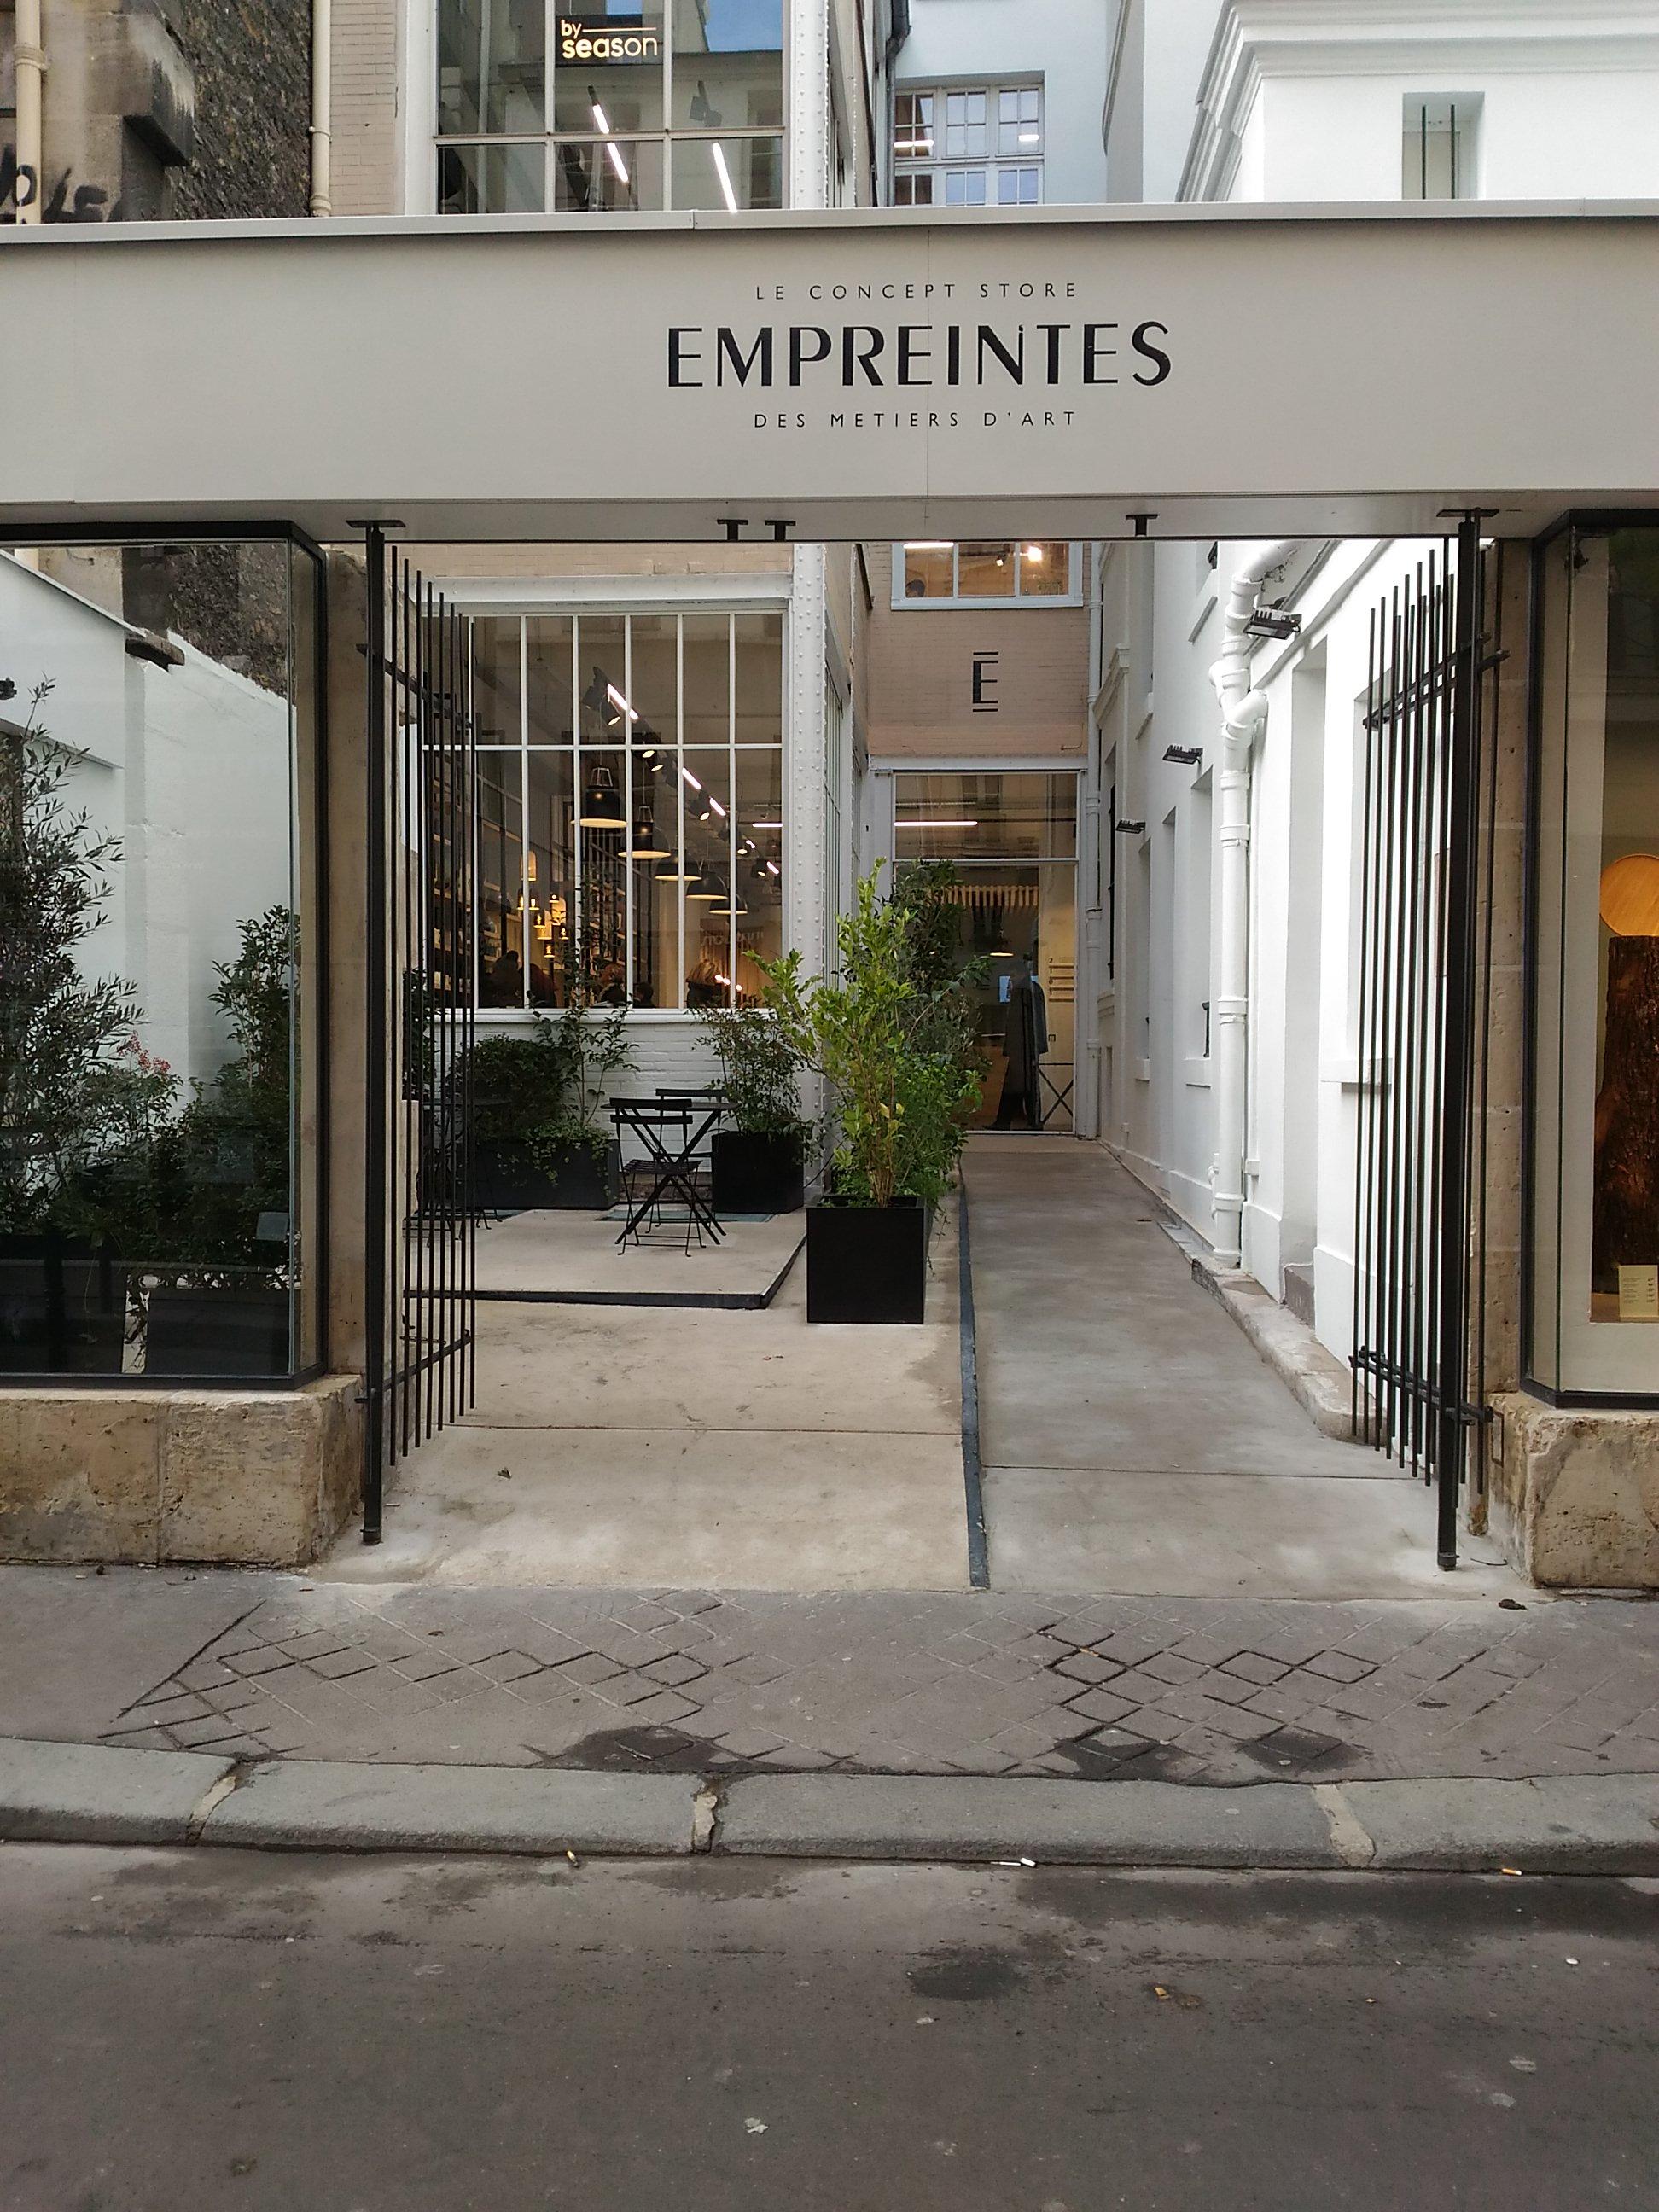 empreintes art concept store 5 rue de picardie 75003. Black Bedroom Furniture Sets. Home Design Ideas